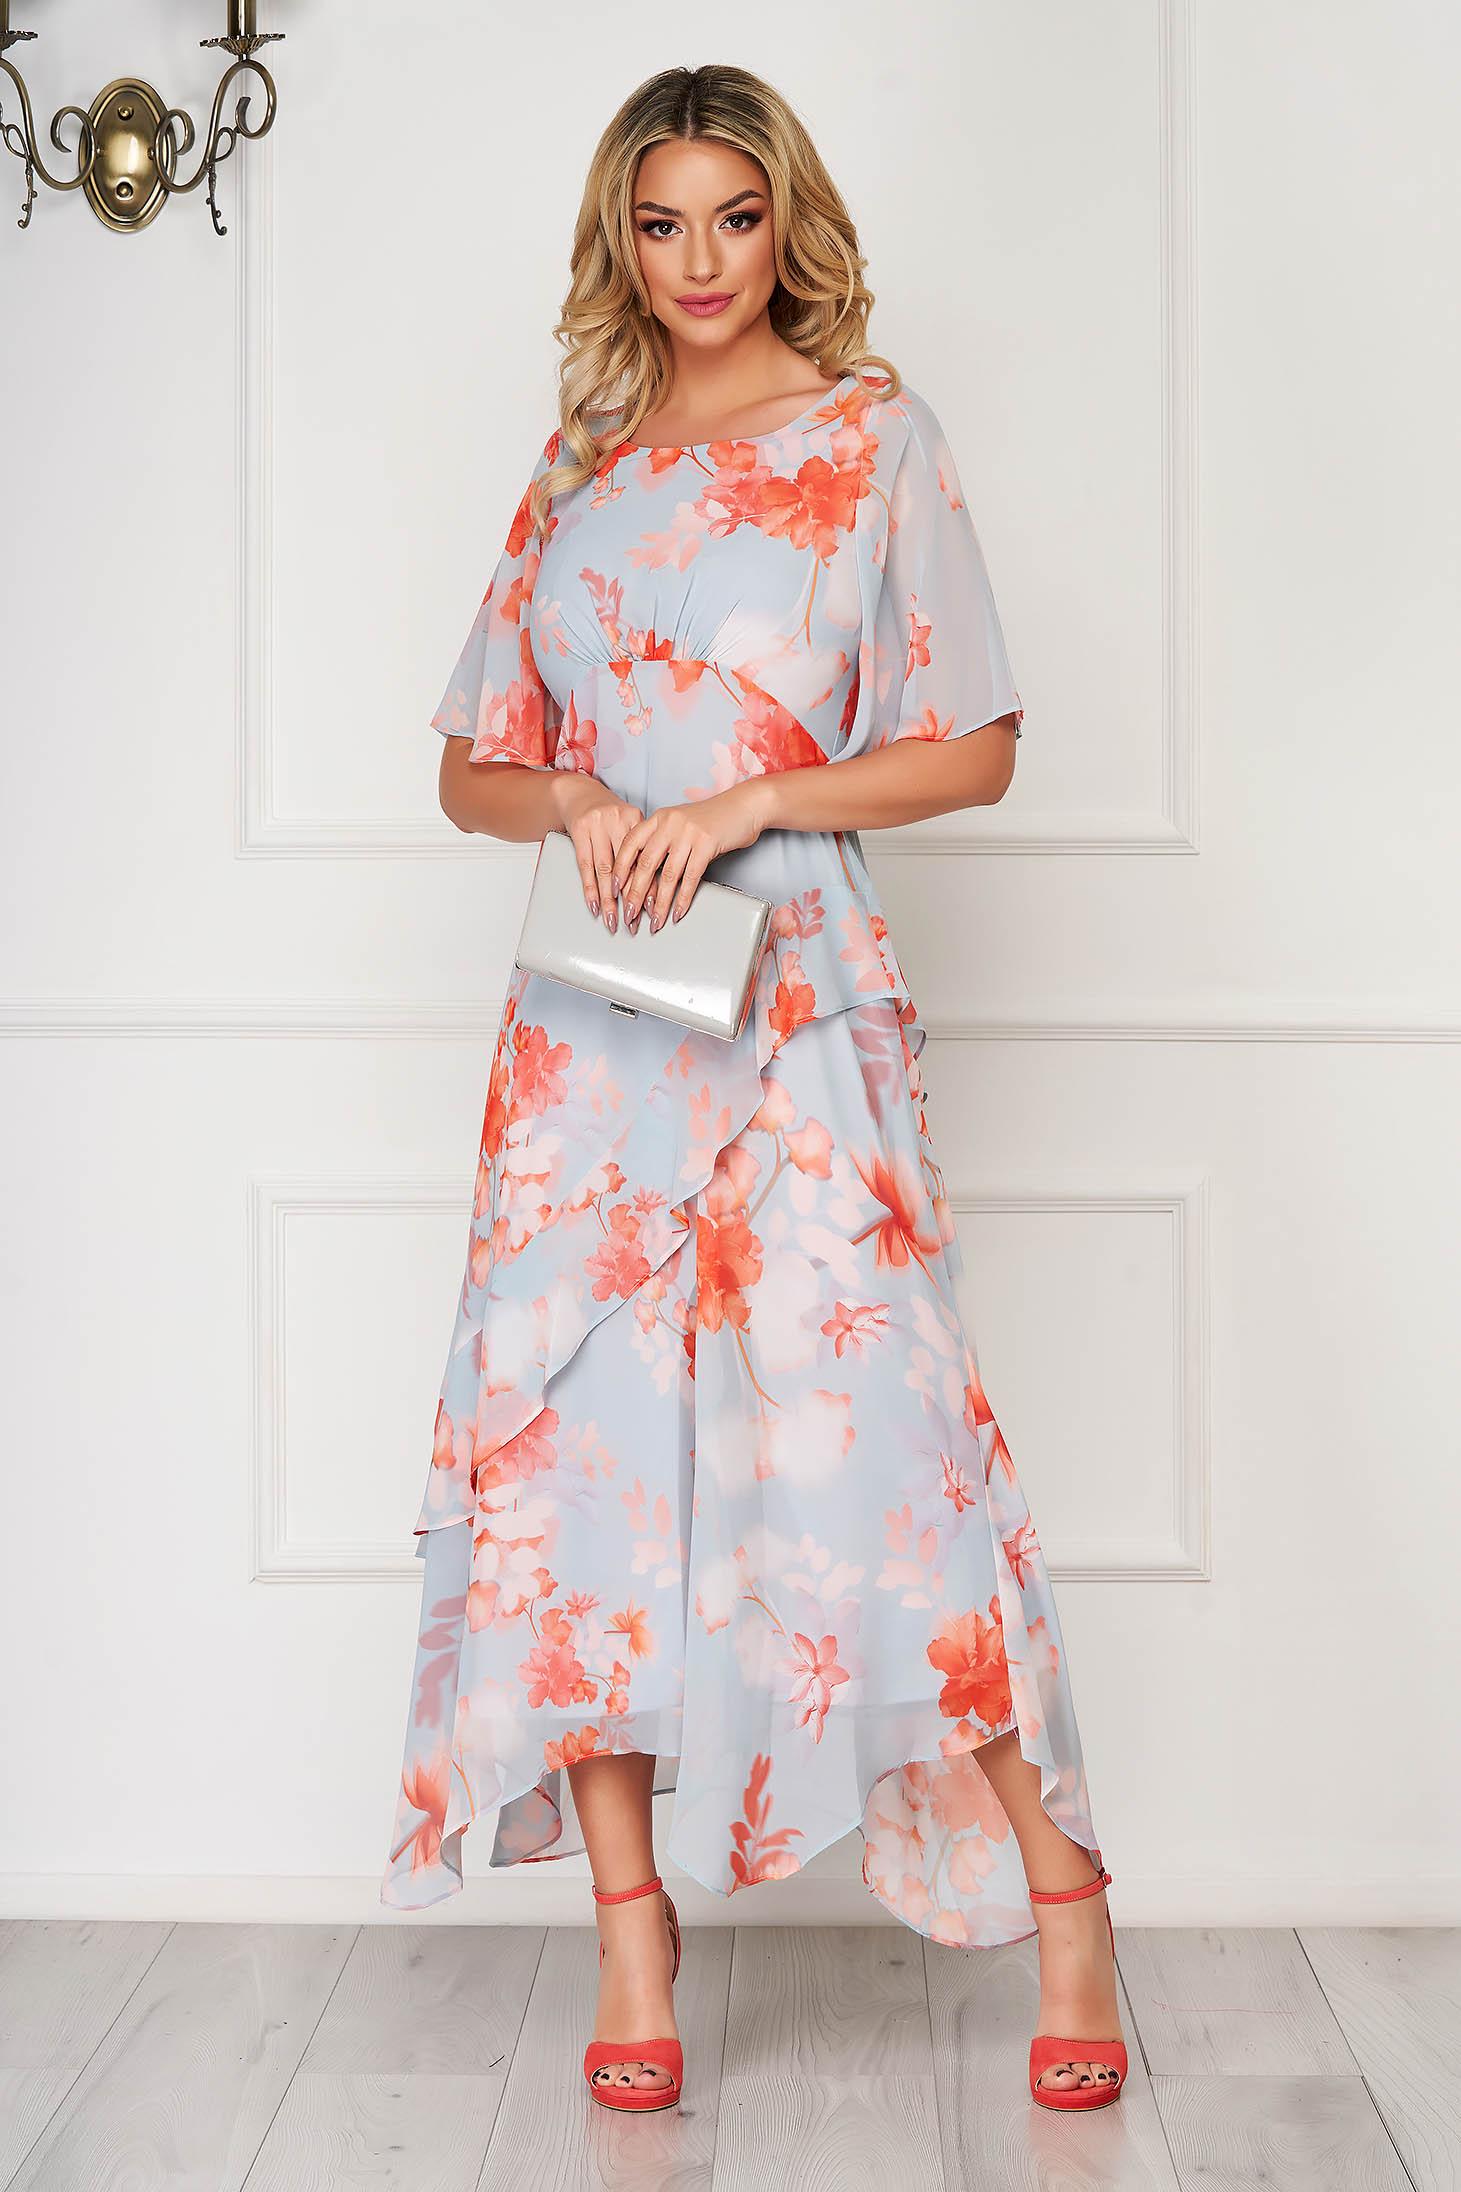 Aqua dress daily elegant asymmetrical cloche voile fabric with floral print